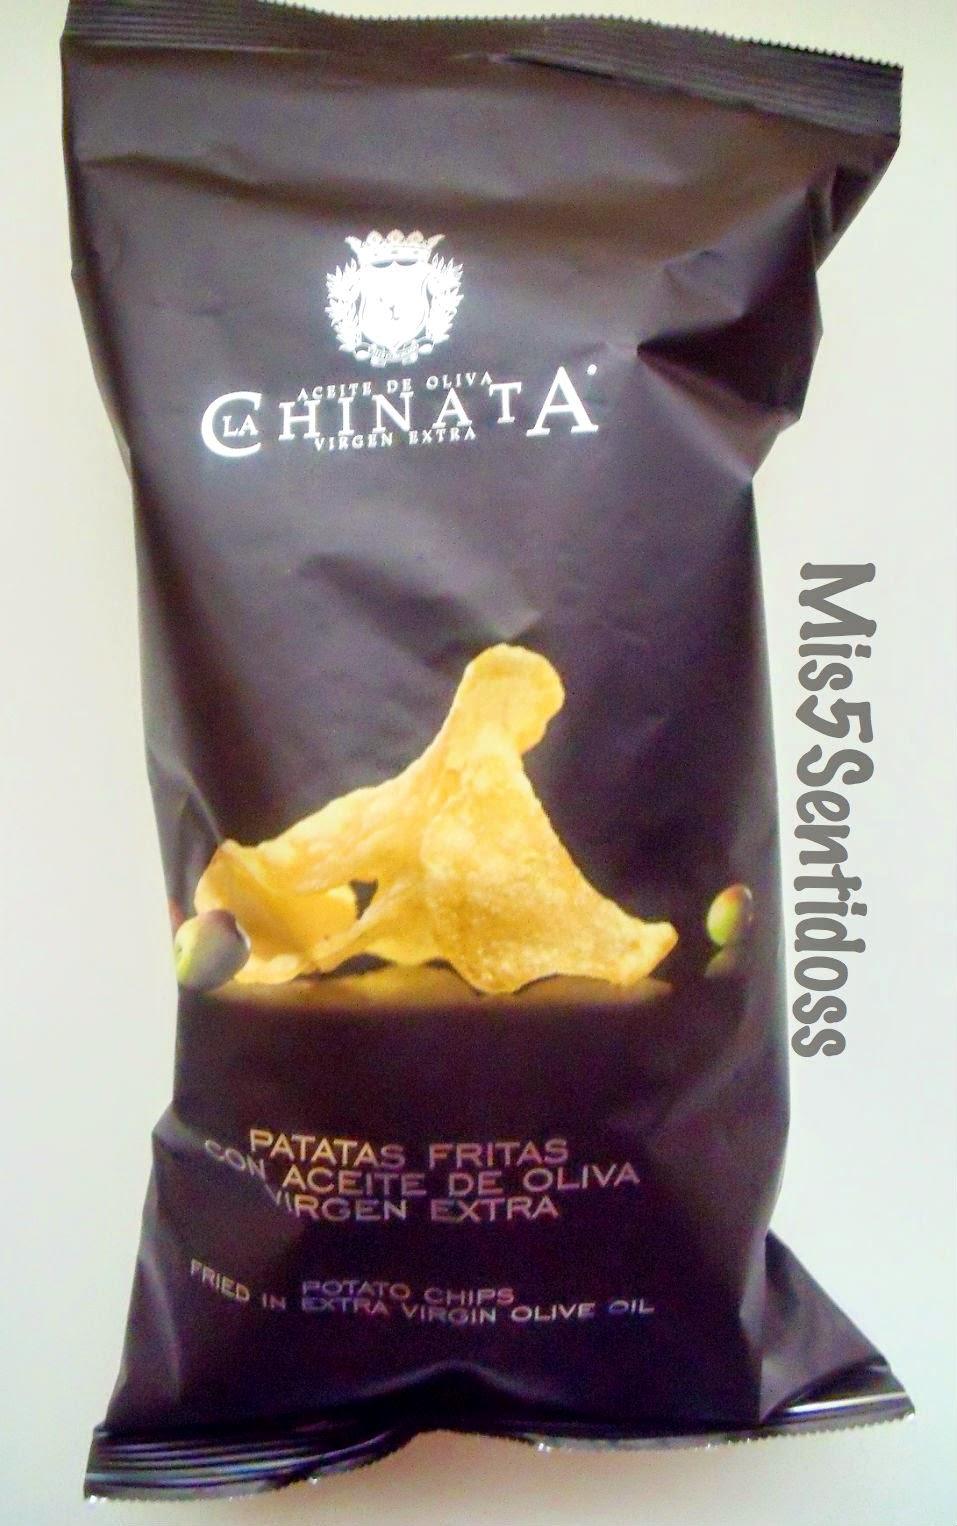 Degustabox Marzo 2014 La Chinata patatas fritas